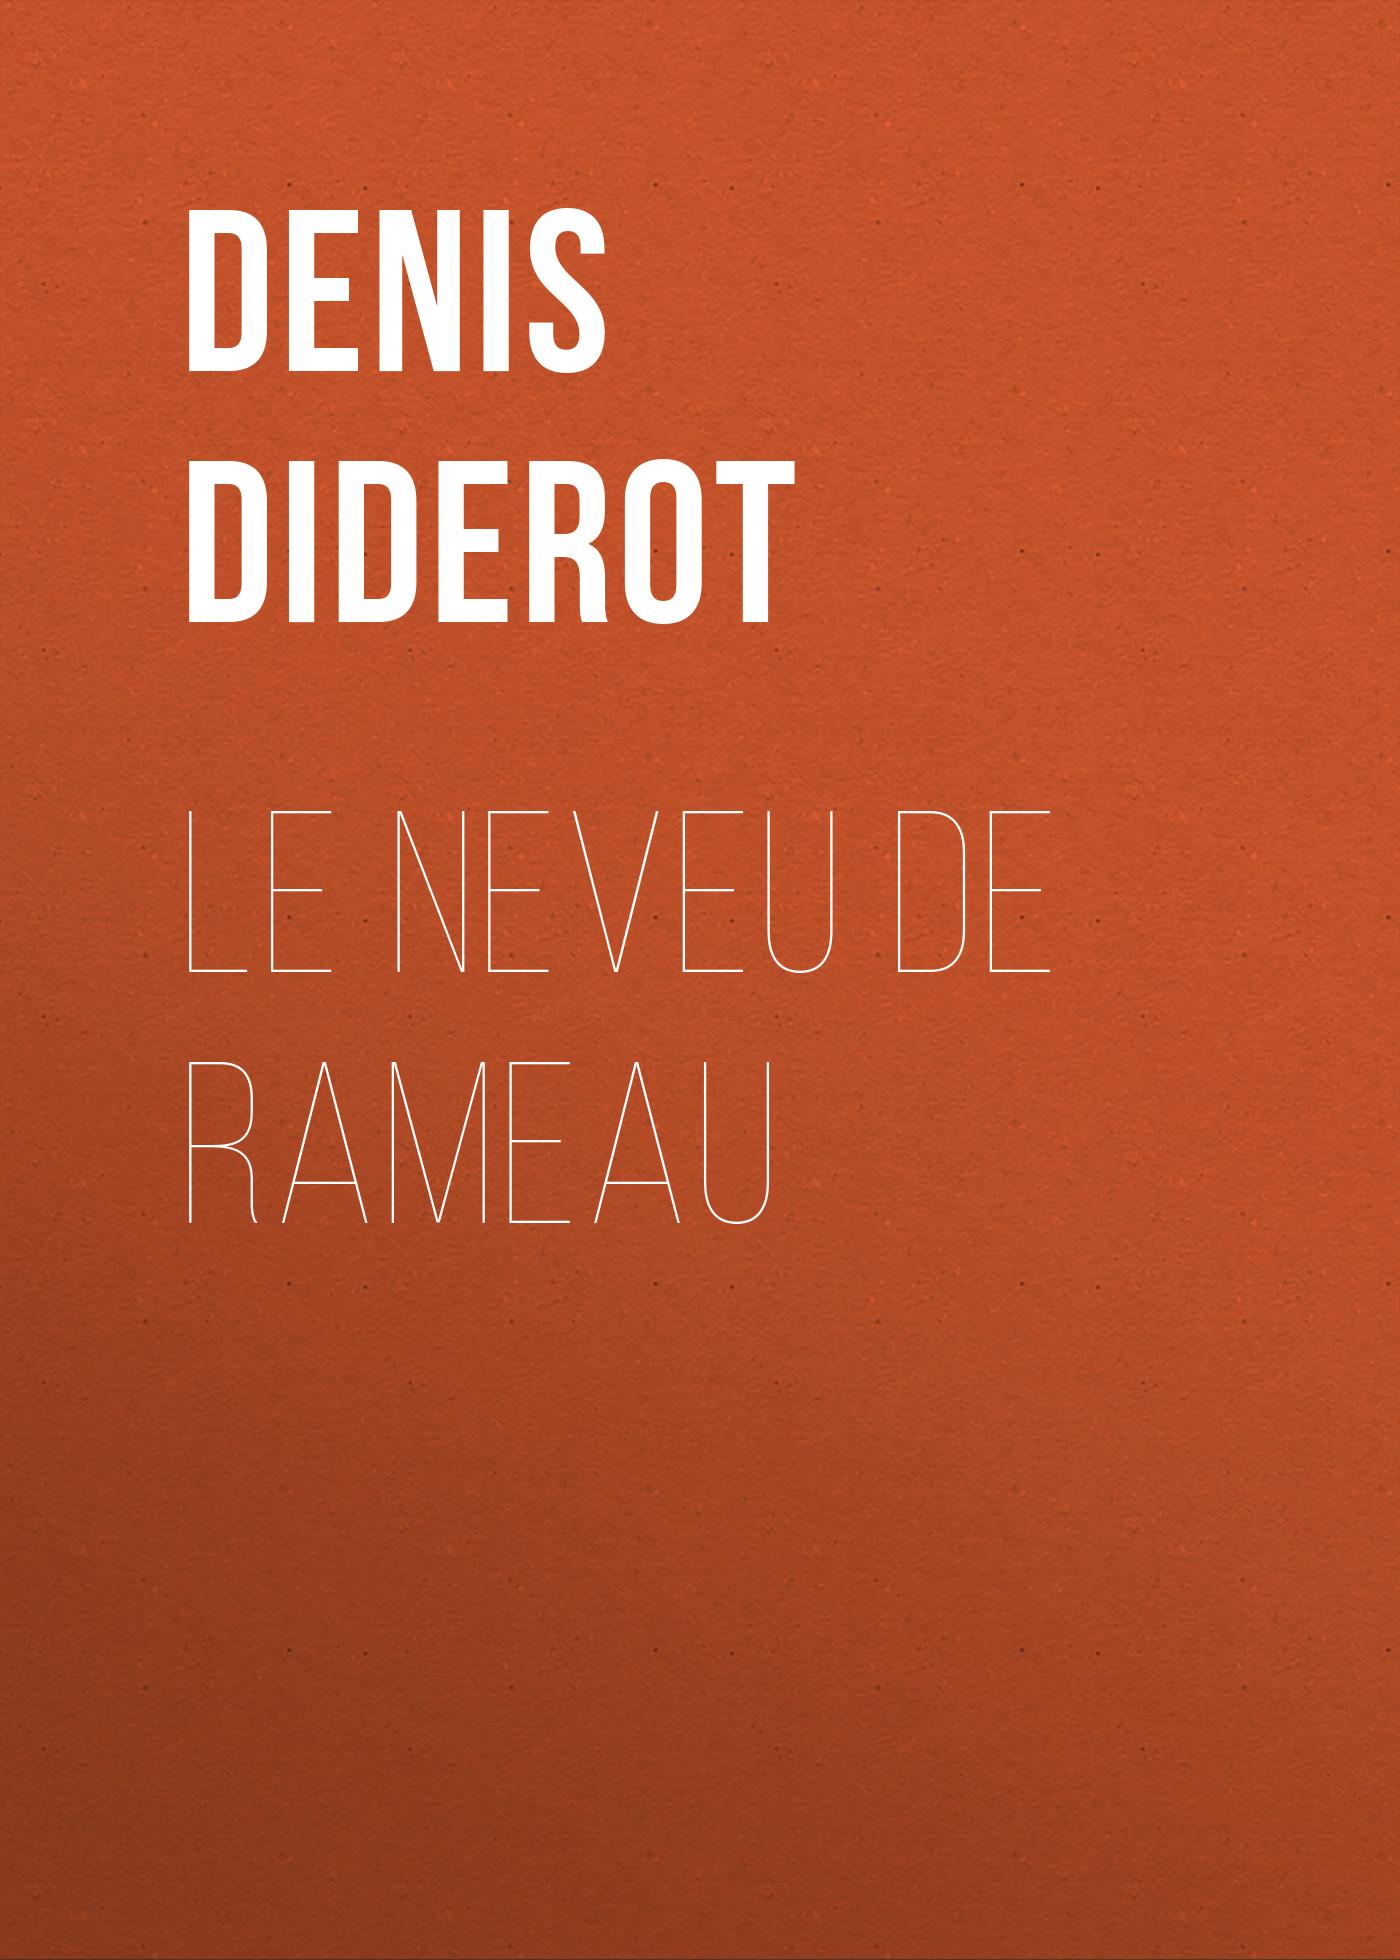 Denis Diderot Le neveu de Rameau цена и фото